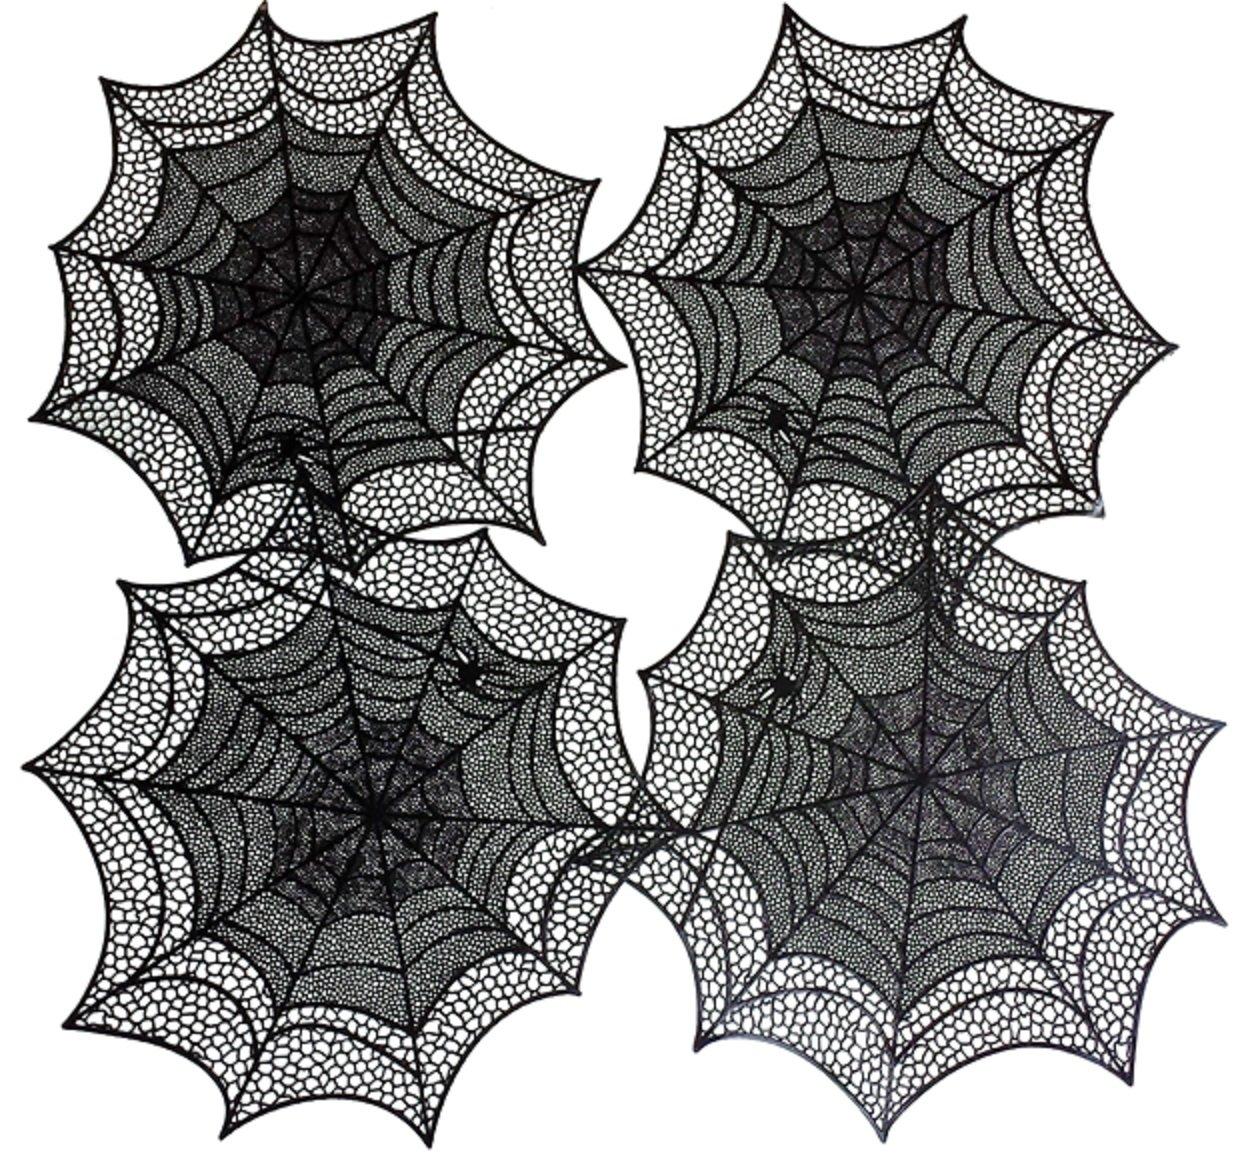 Benson Mills Spider Web Pressed Vinyl Placemats, Black, Set of 4